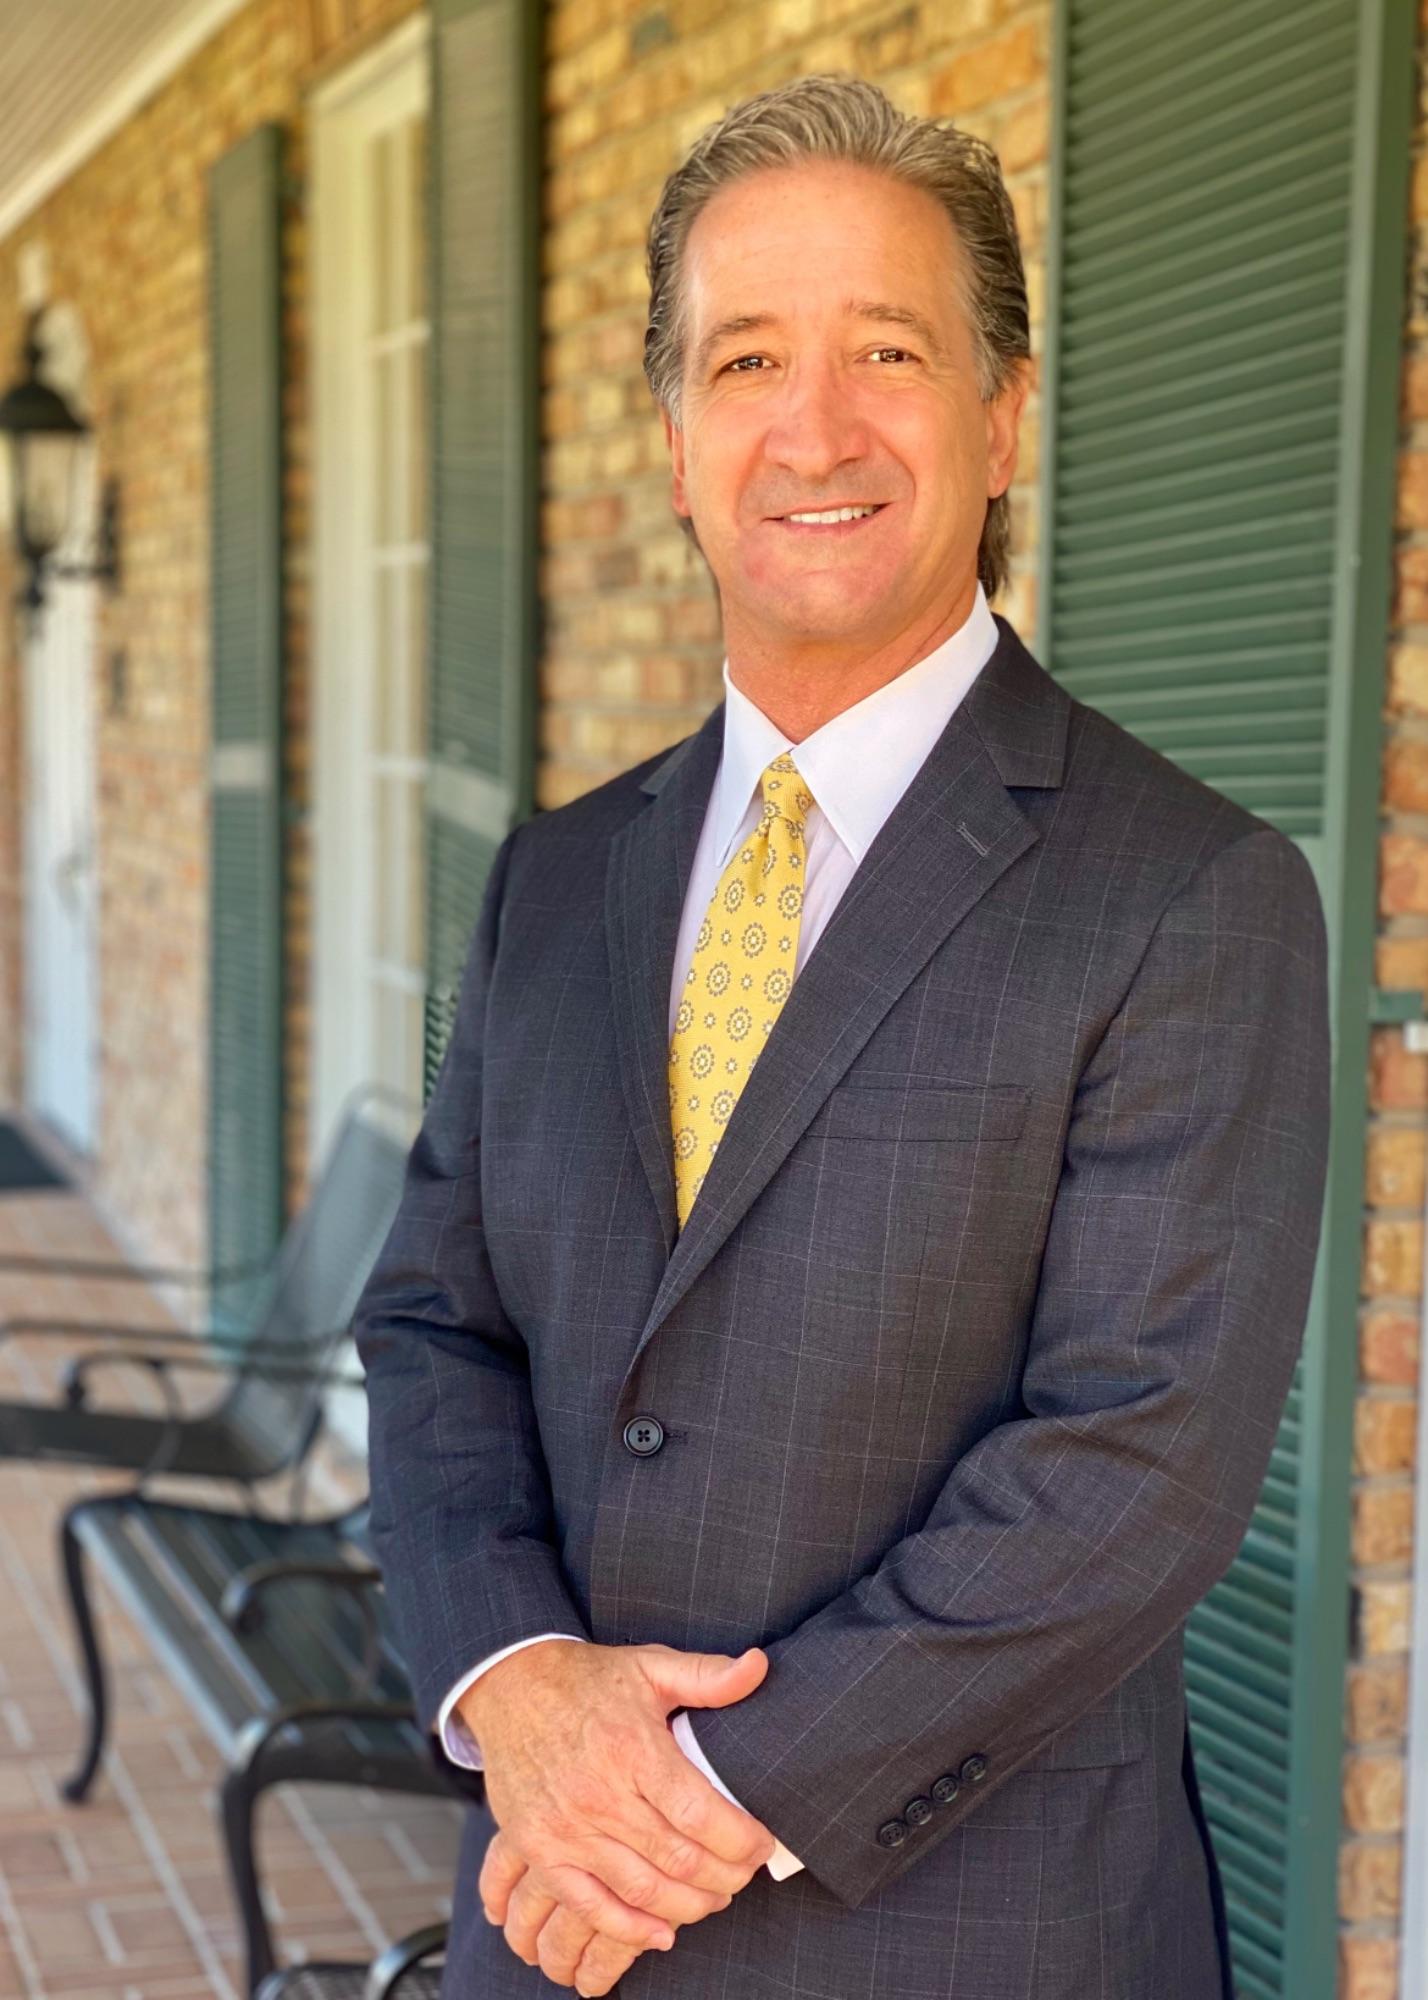 Photo of Frank Pellerin - Vice President / Secretary-Treasurer - Funeral Director